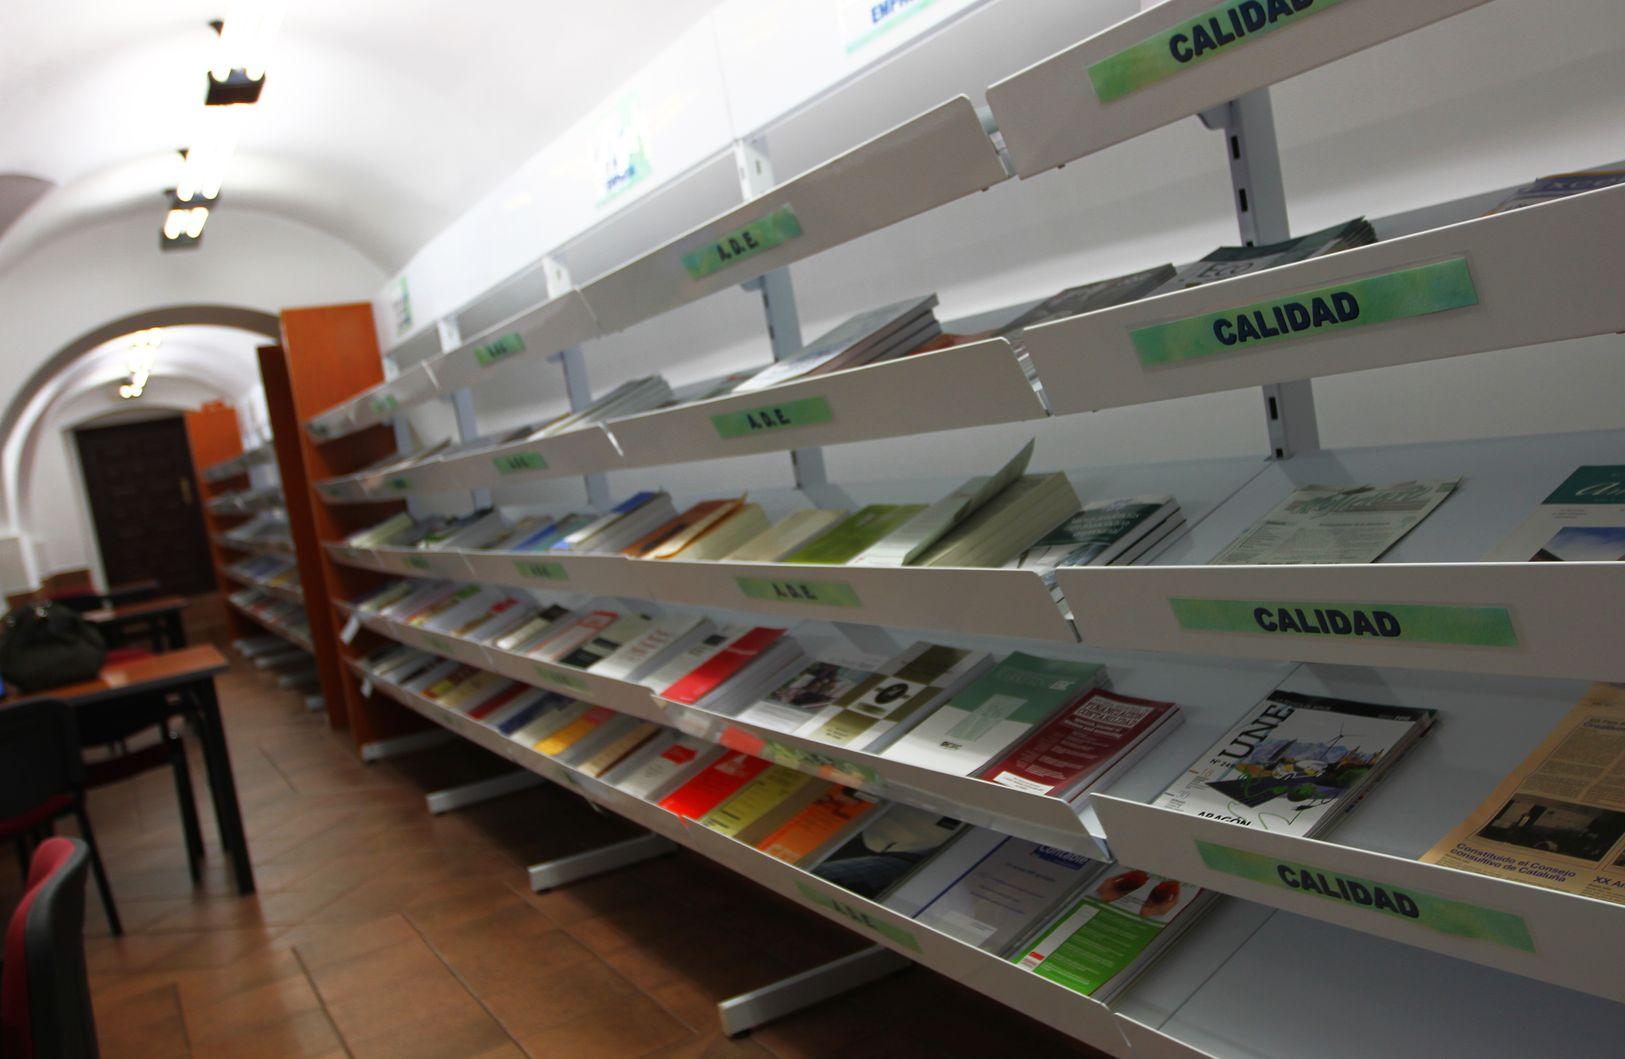 Hemeroteca linea libros_result.jpg